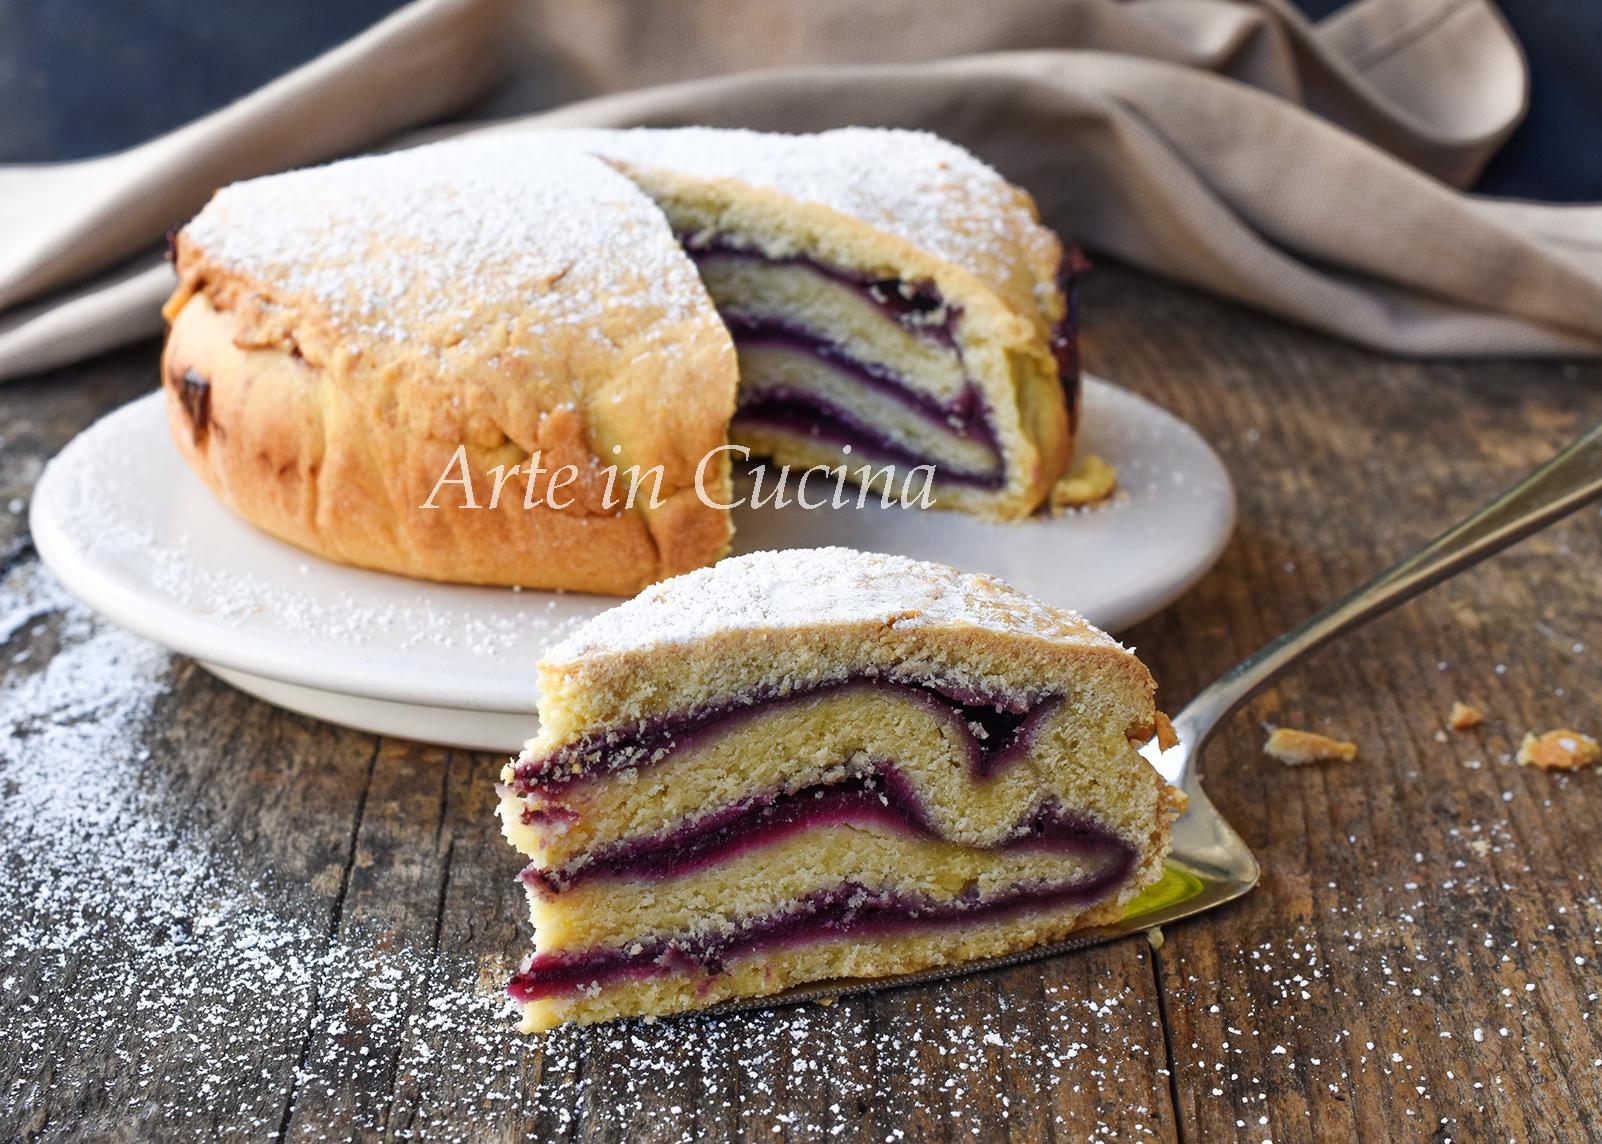 Torta crostata millefoglie alla marmellata vickyart arte in cucina